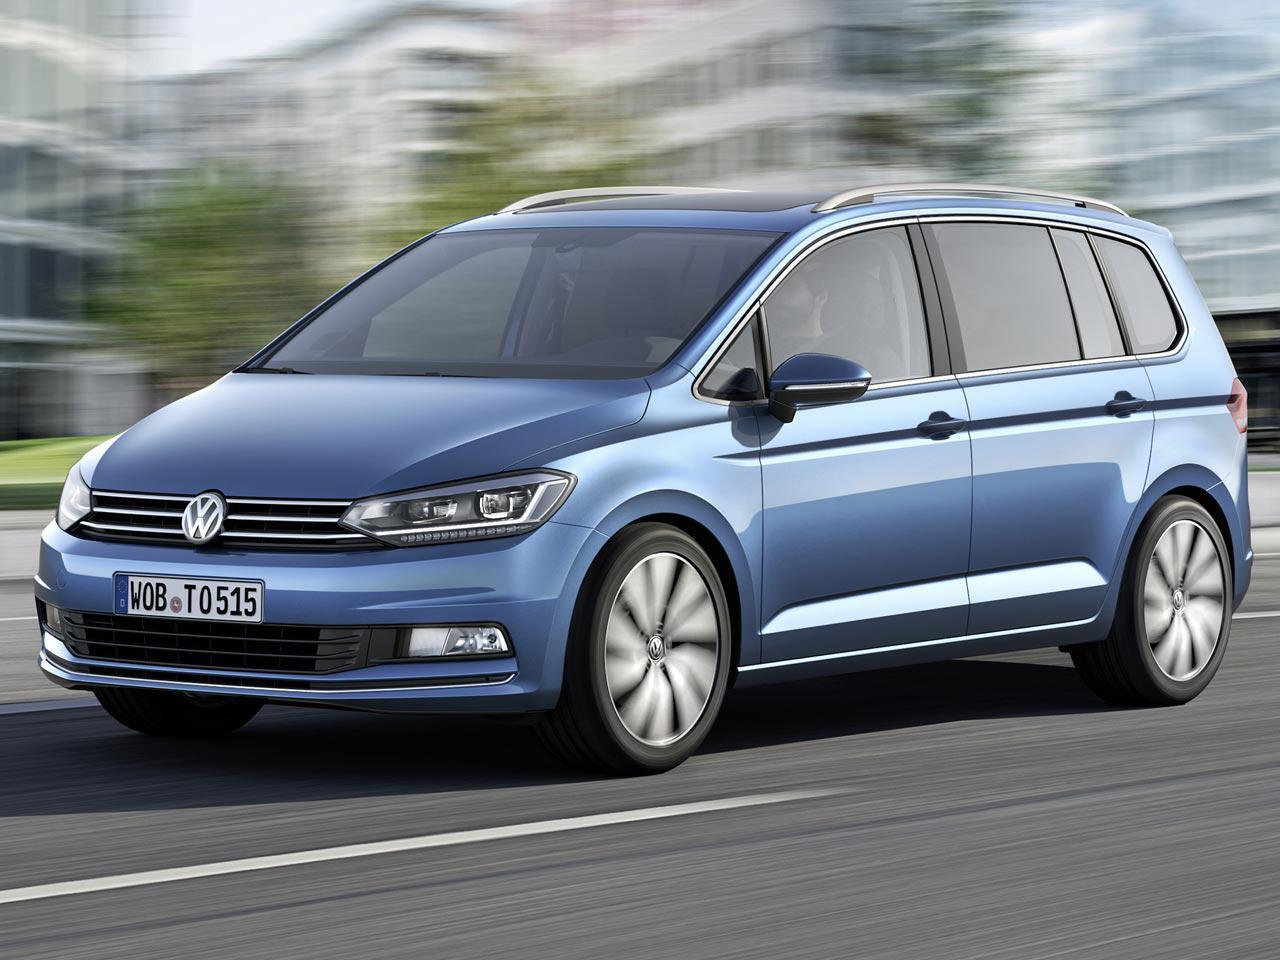 Bild zu 3. Platz: VW Touran